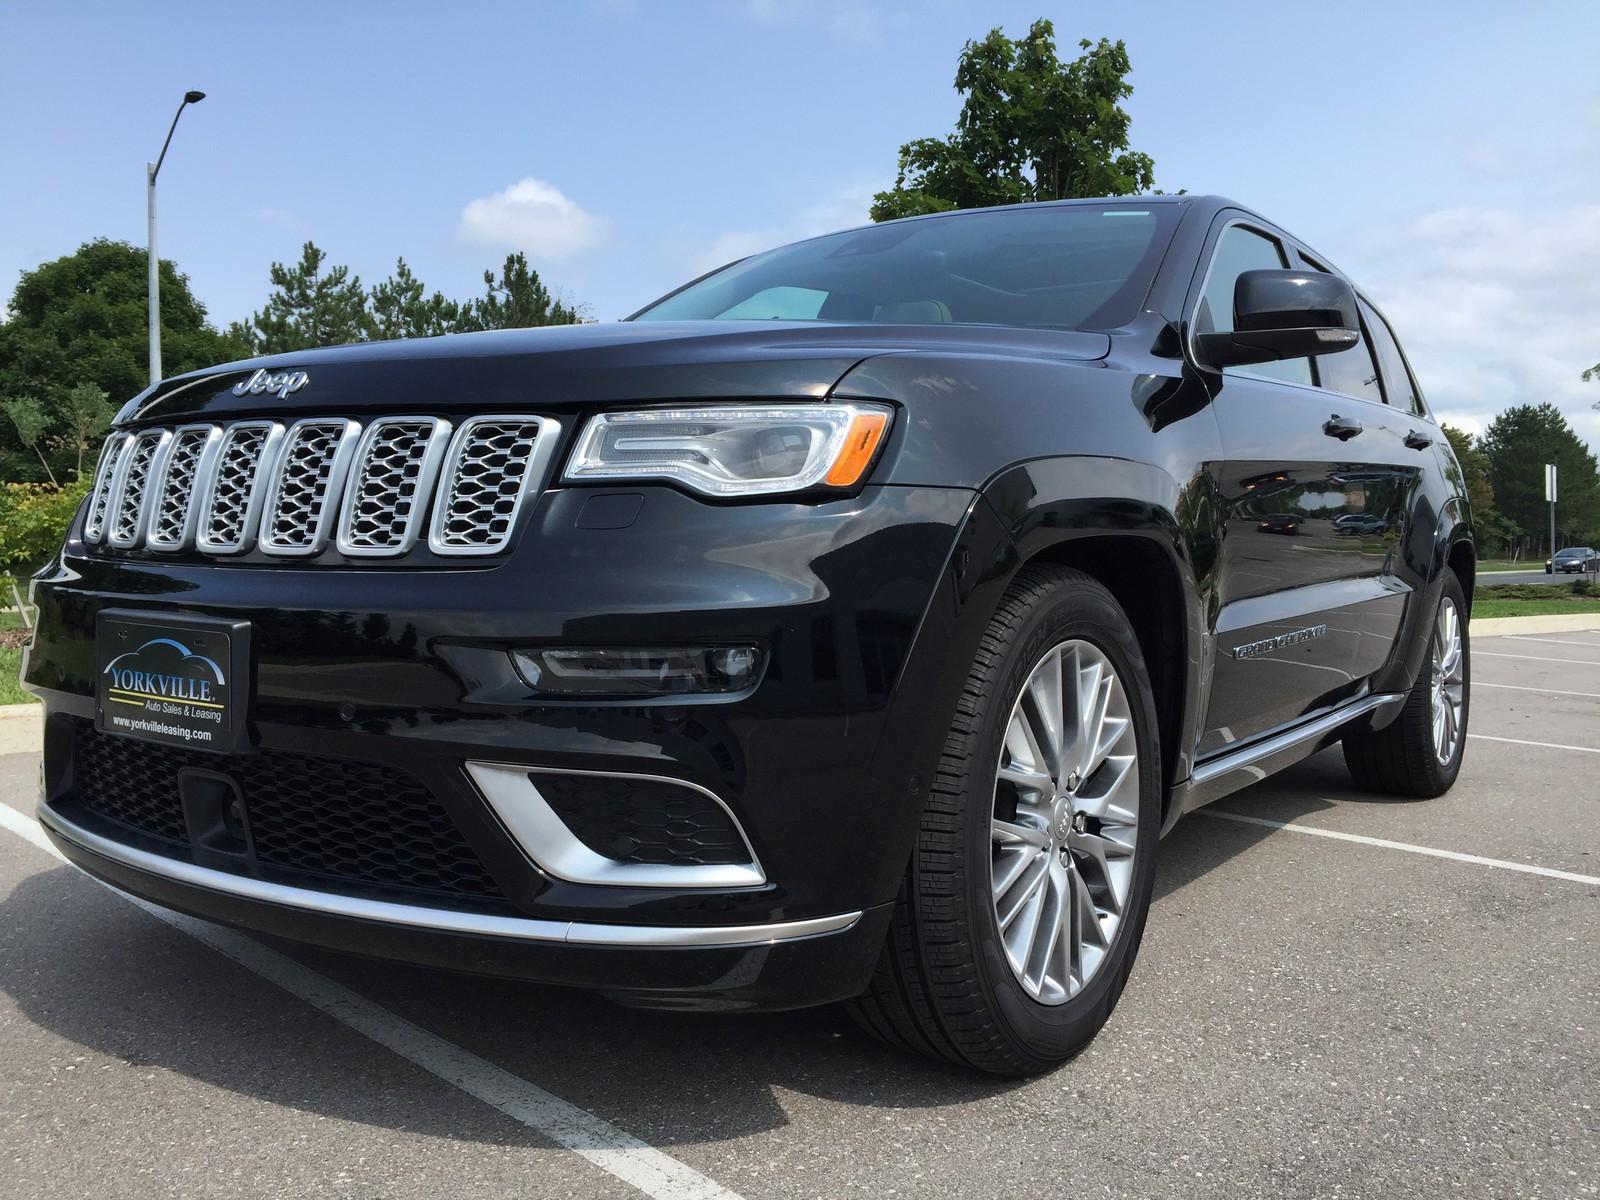 2018 Jeep Grand Cherokee Summit - LOADED!